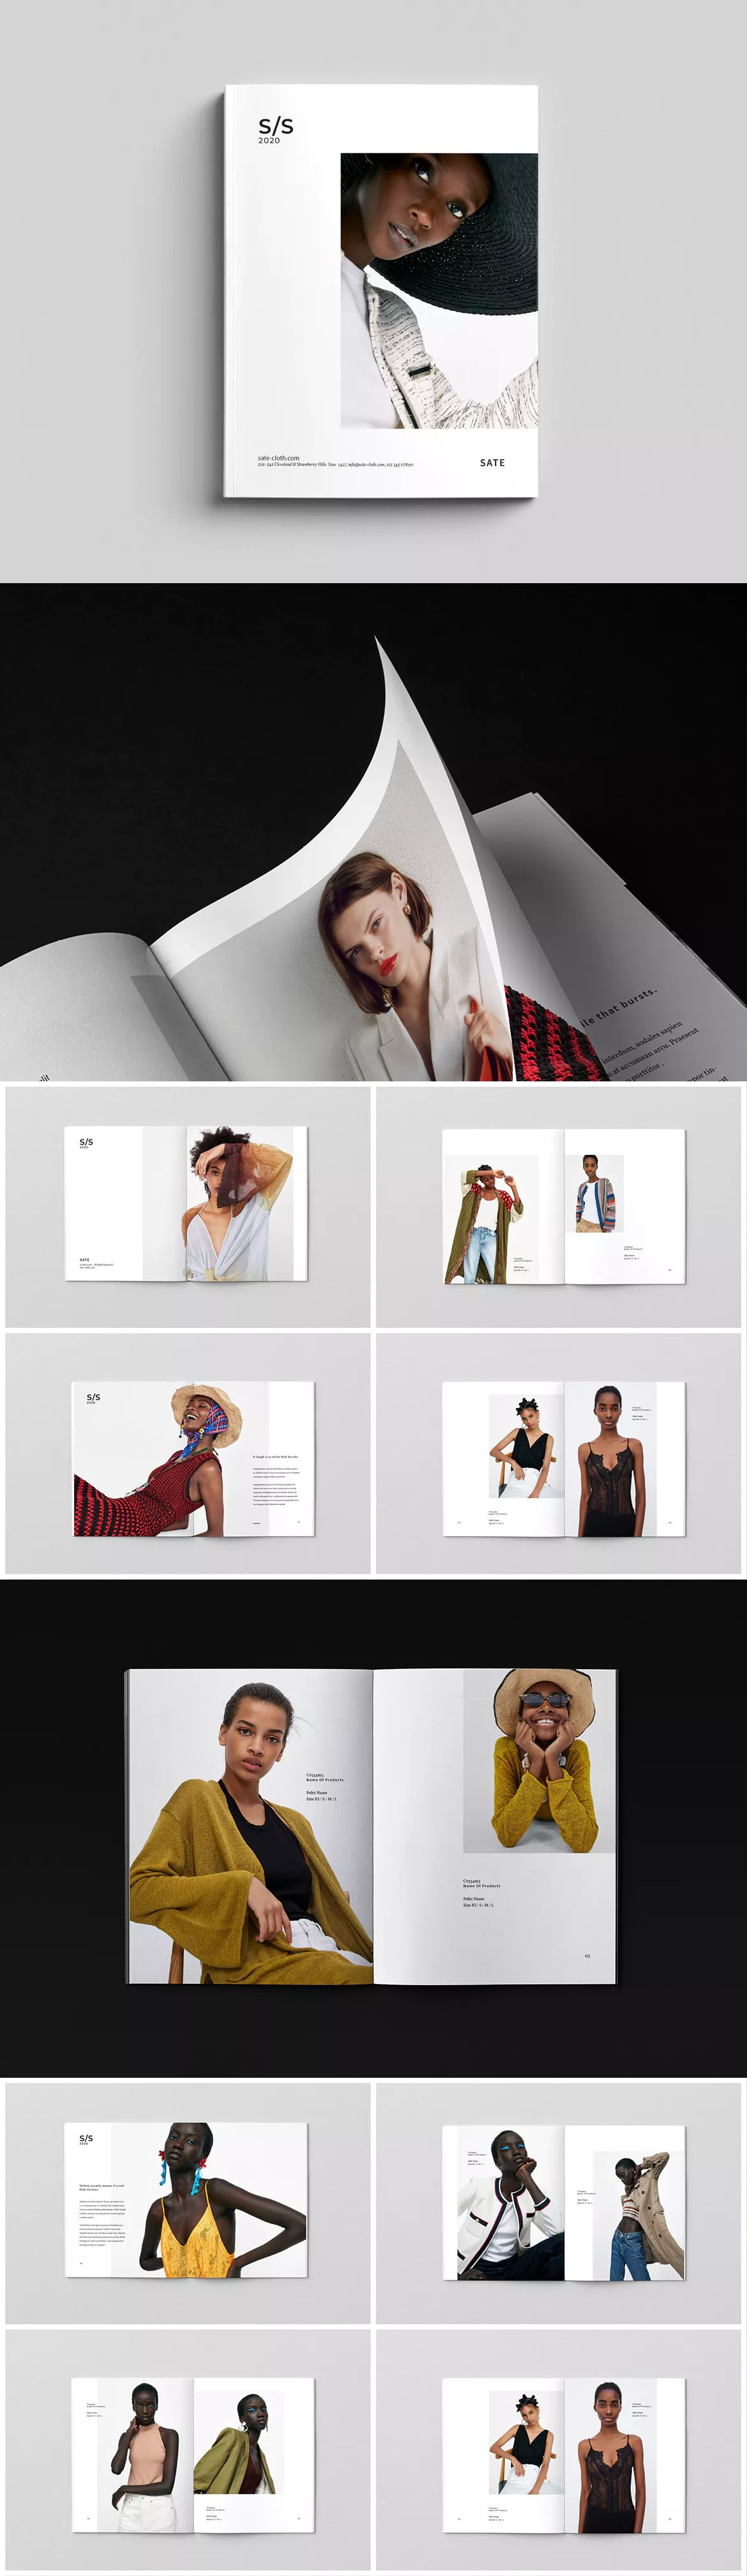 lookbook template indesign indd a4 us letter size lookbook